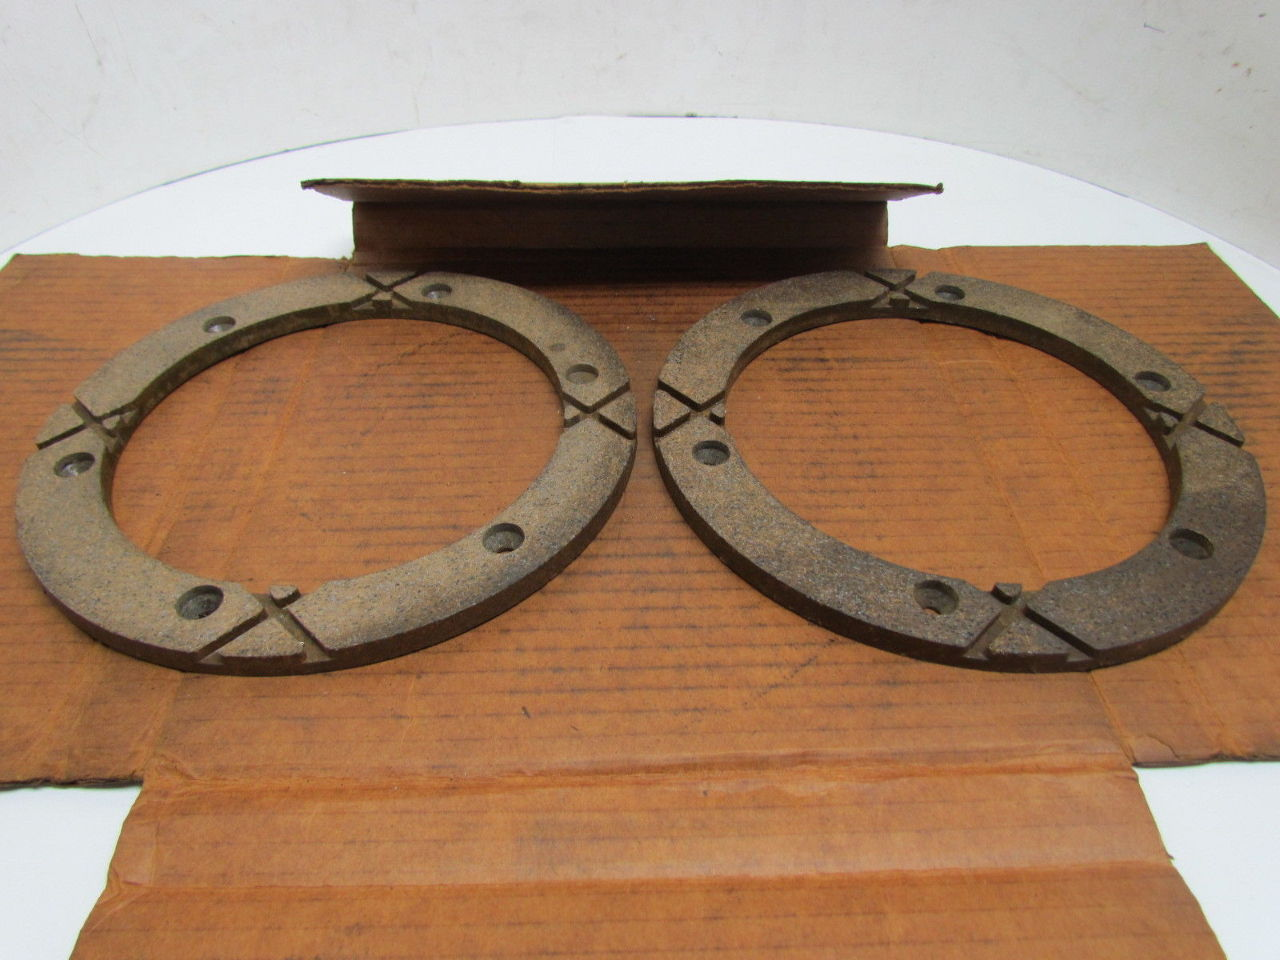 Round Friction Disc : Horton nexen facing friction disc pad brake clutch